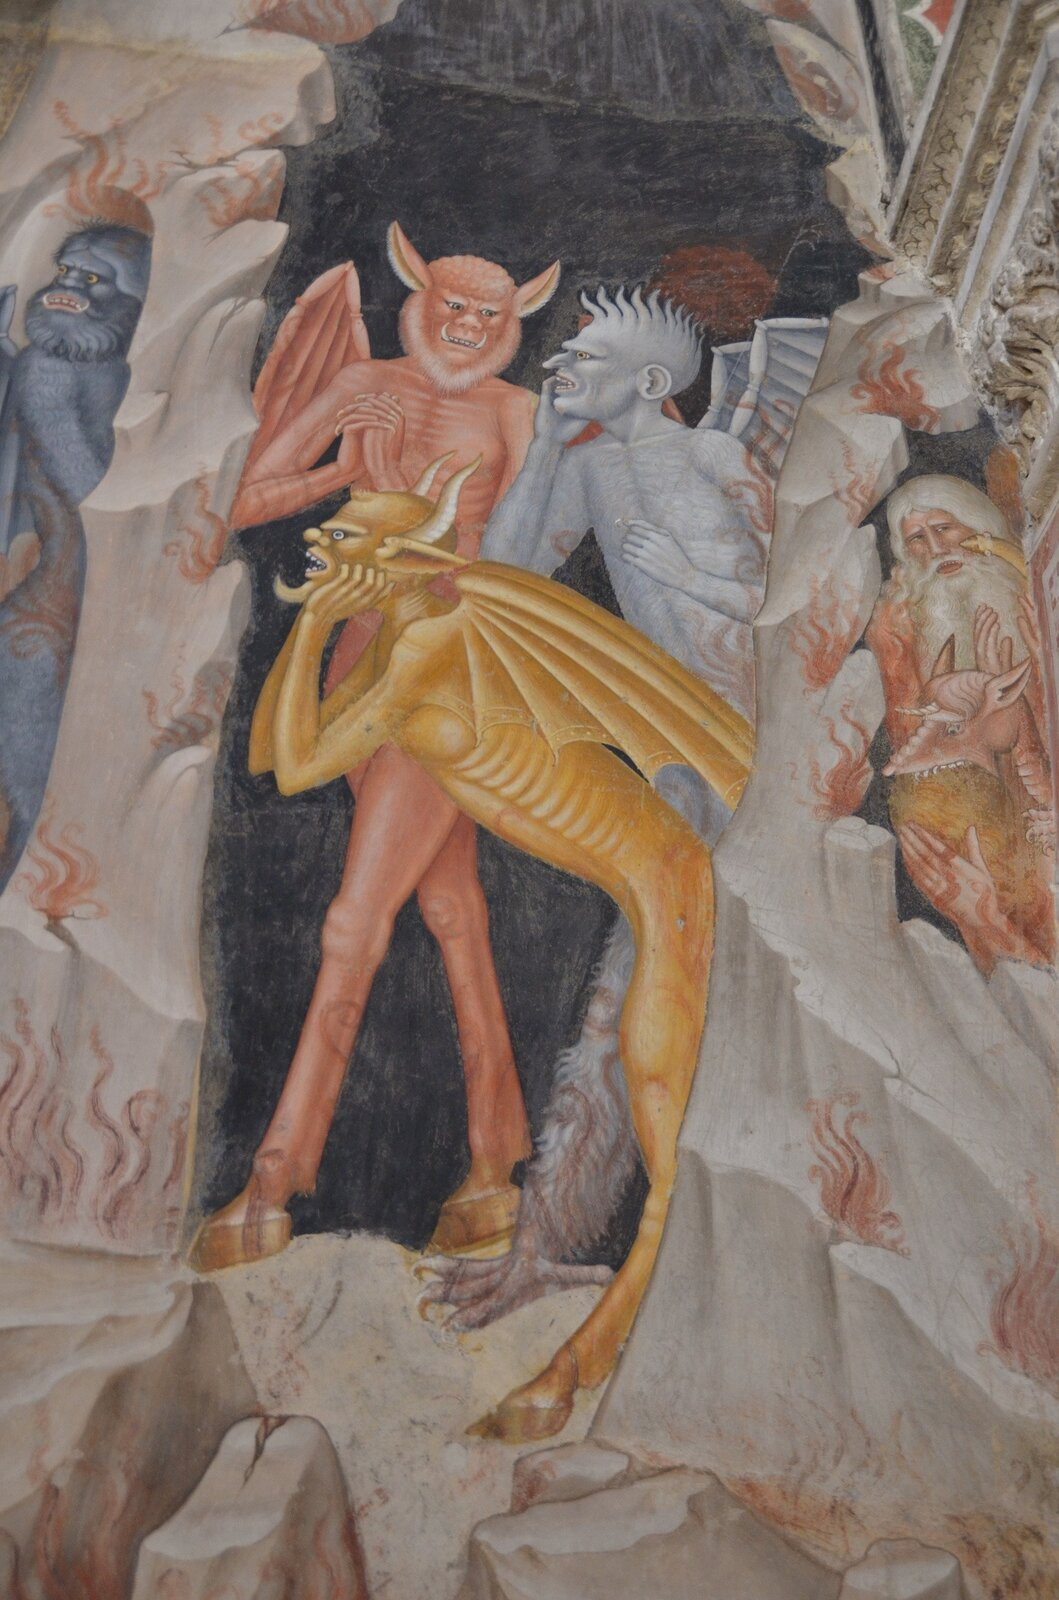 Andrea di Bonaiuto, Zstąpienie do Otchłani, detal, ok. 1365, fresk wkaplicy hiszpańskiej wkościele Santa Maria Novella, Florencja Andrea di Bonaiuto, Zstąpienie do Otchłani, detal, ok. 1365, fresk wkaplicy hiszpańskiej wkościele Santa Maria Novella, Florencja Źródło: Richard Mortel, licencja: CC BY-SA 2.0.